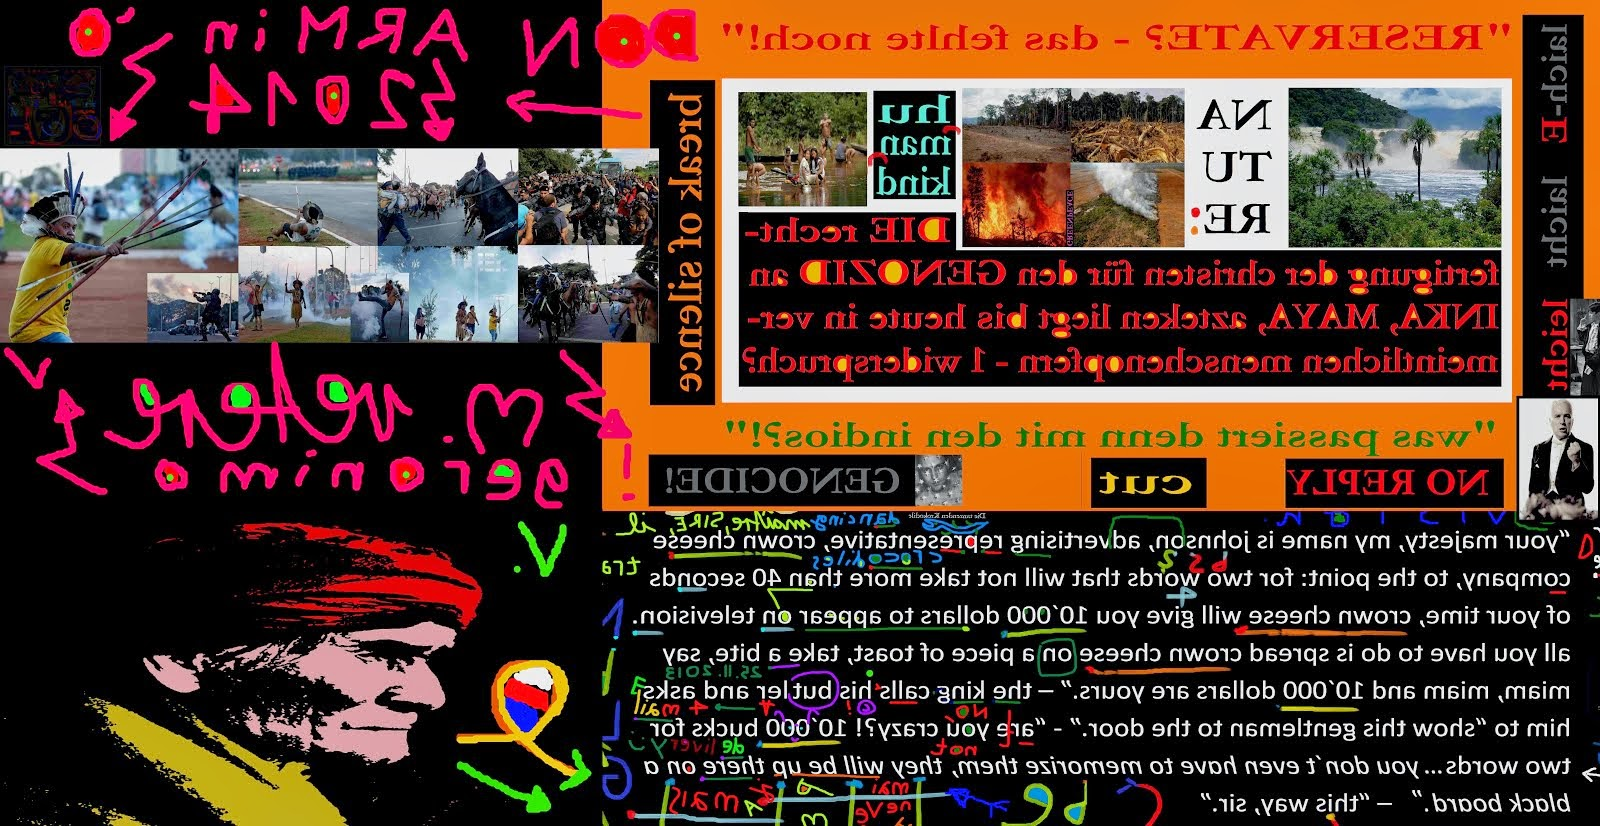 zensur gegen mischa vetere mvart4u 2011 -2014, familienmord vandalsimus körperverletzung diskriminA